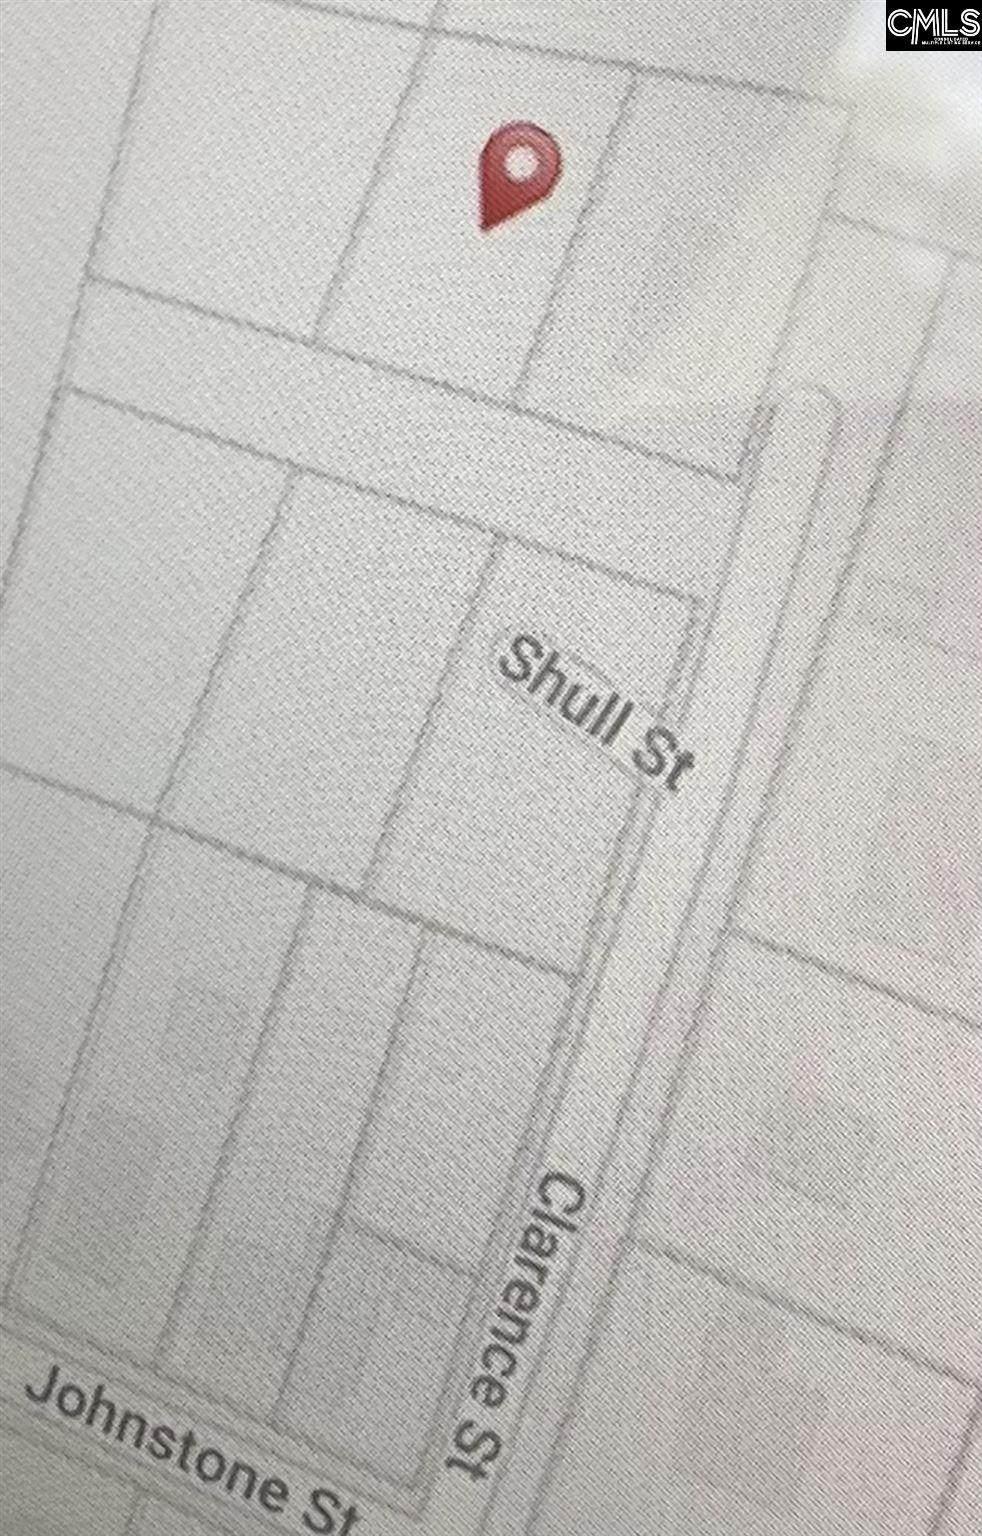 Shull Street - Photo 1